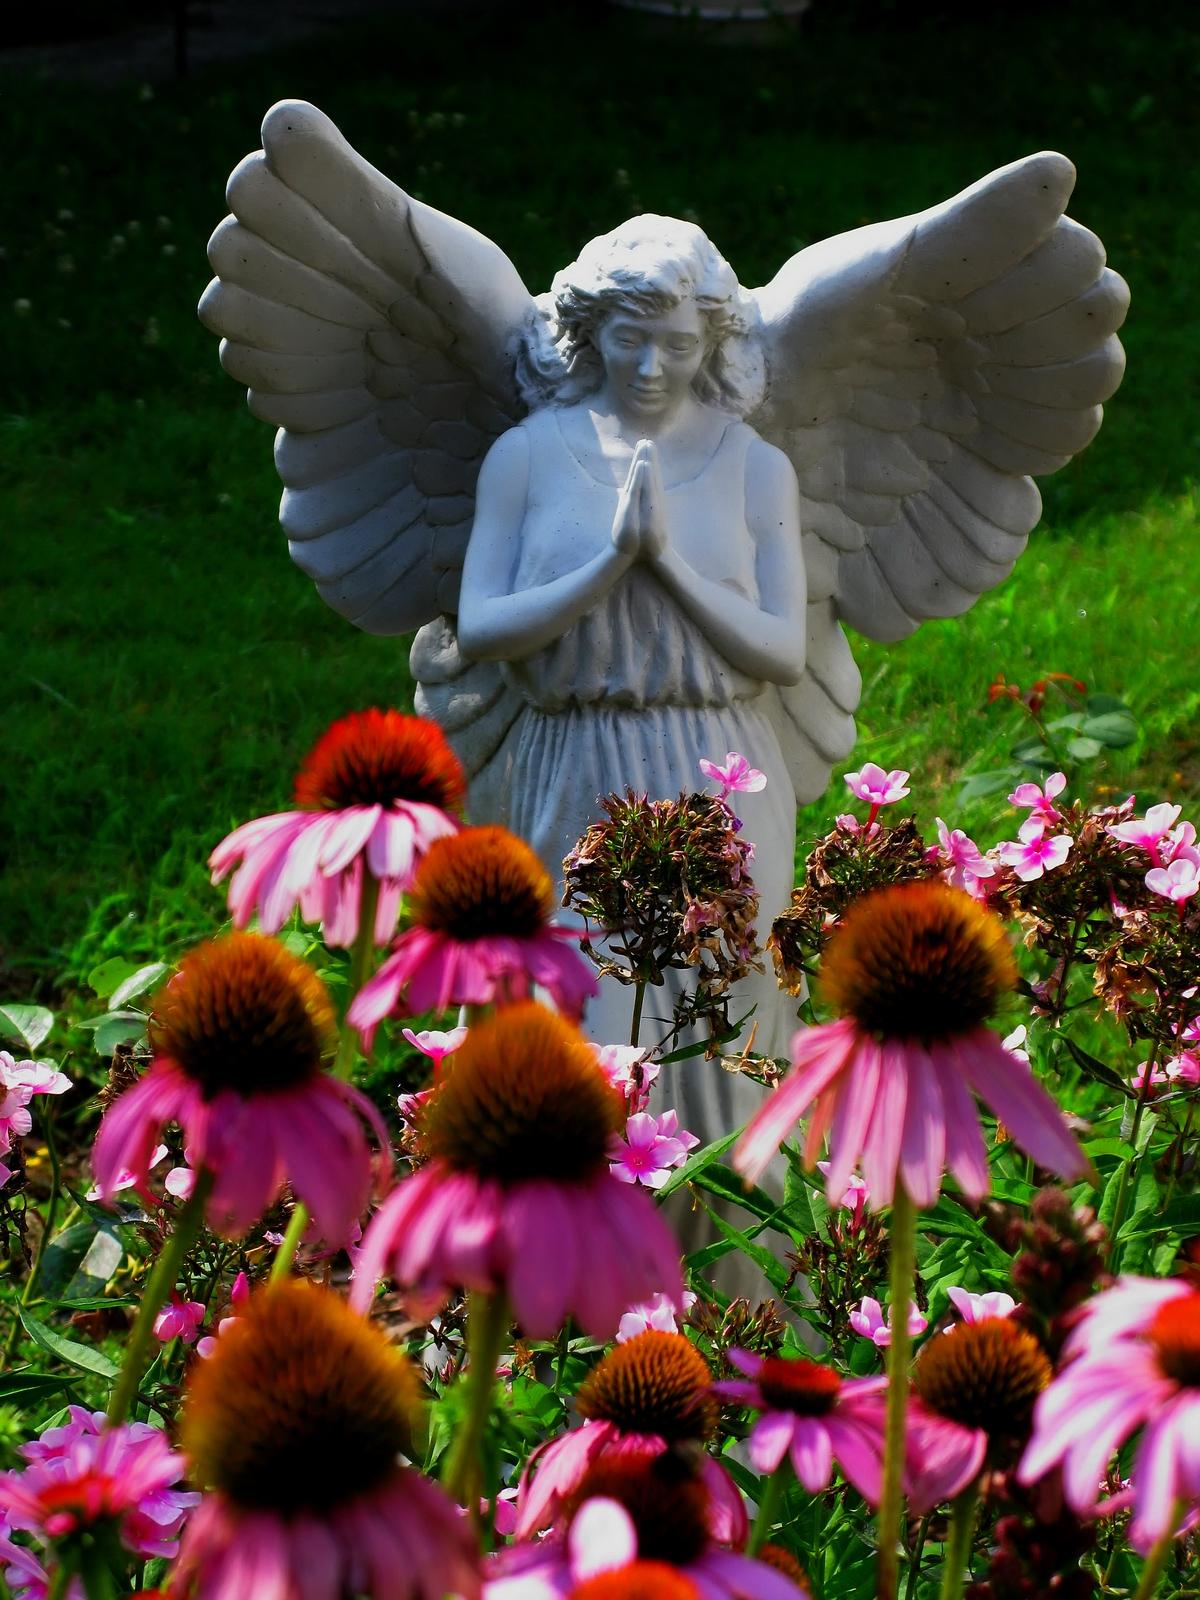 hellertown, pennsylvania, prayer, flowers, pink, angel, nature, , photo